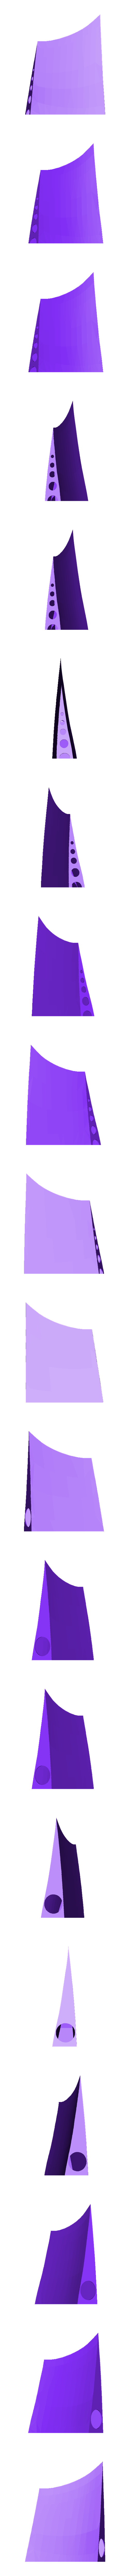 Wing R1B.obj Download free OBJ file Small Static Horten 229 • 3D printable object, francoispeyper